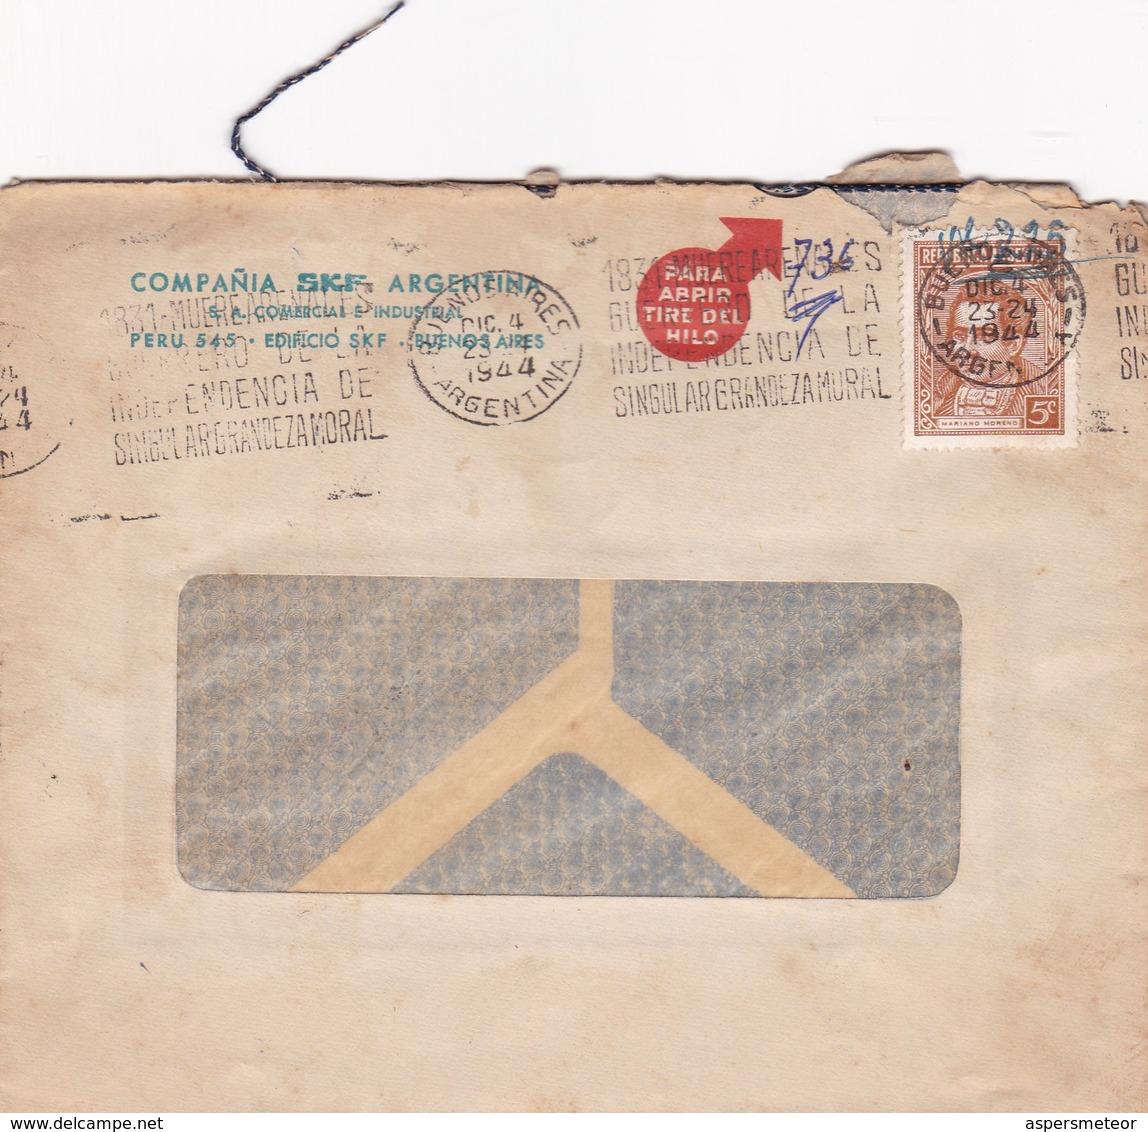 1944 COMMERCIAL COVER- COMPAÑIA SKF ARGENTINA. CIRCULEE BUENOS AIRES ARGENTINE, BANDELETA PARLANTE- BLEUP - Argentine